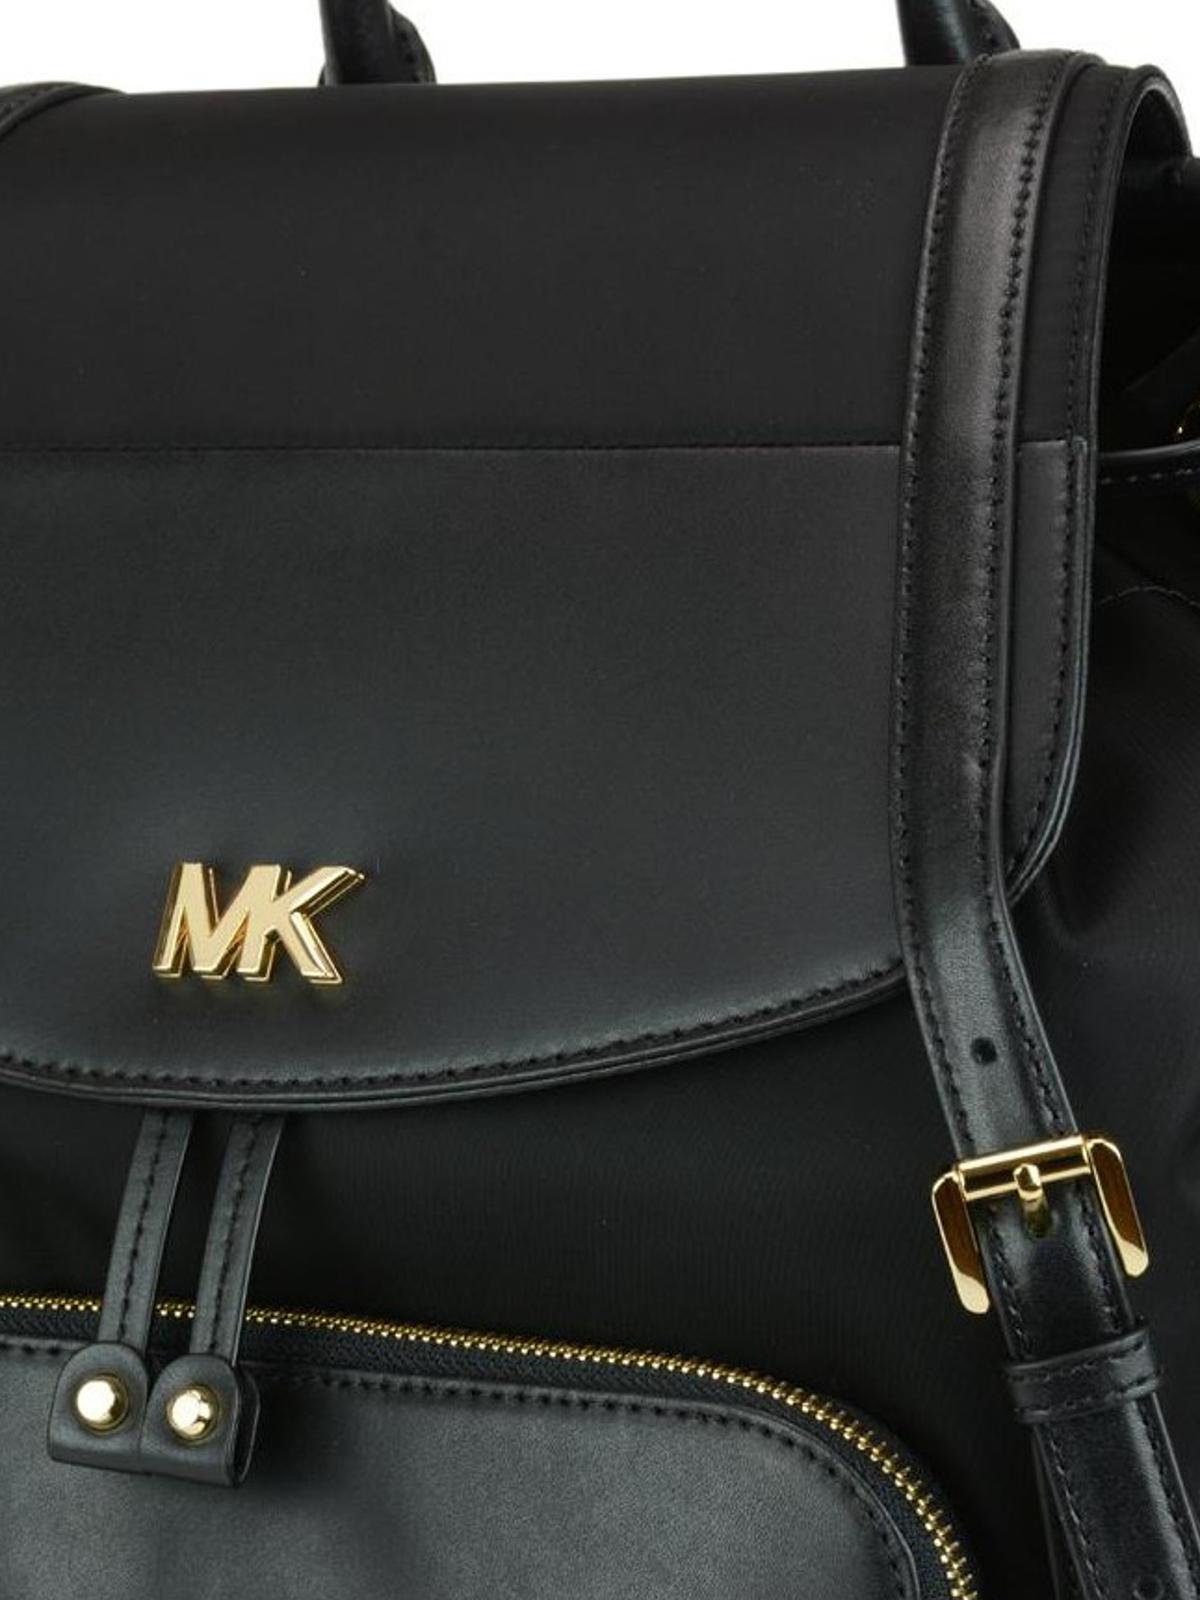 3da3d9987ce4 Michael Kors - Mott L black nylon diaper backpack - کوله پشتی ...